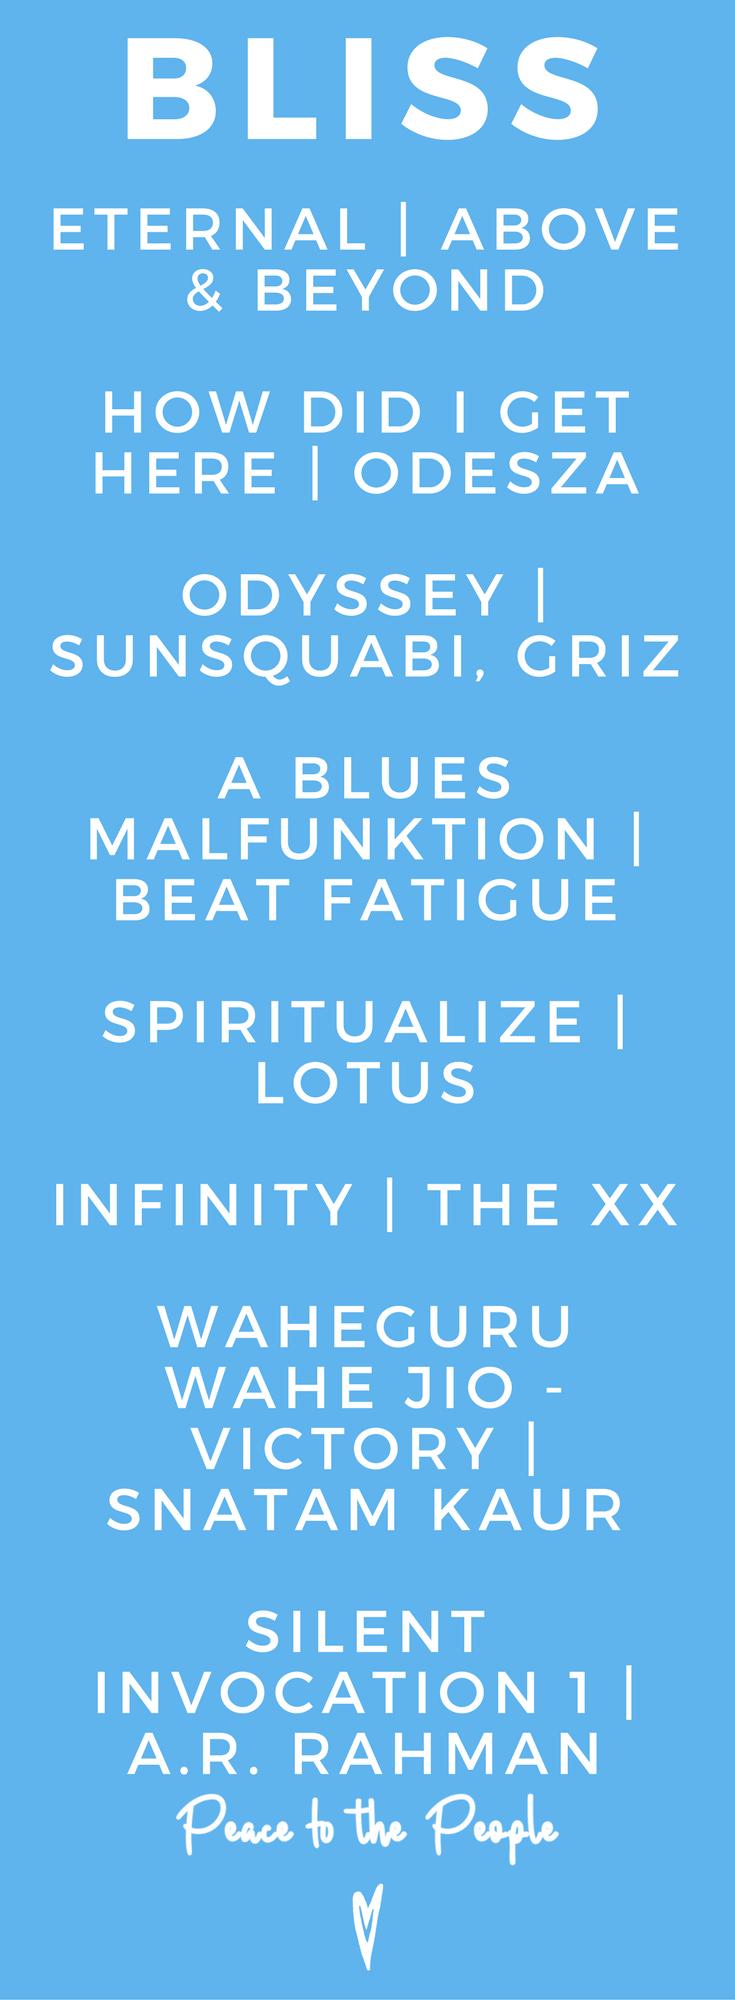 Bliss Yoga Feel Good Energizing Vinyasa Flow Playlists Music.png